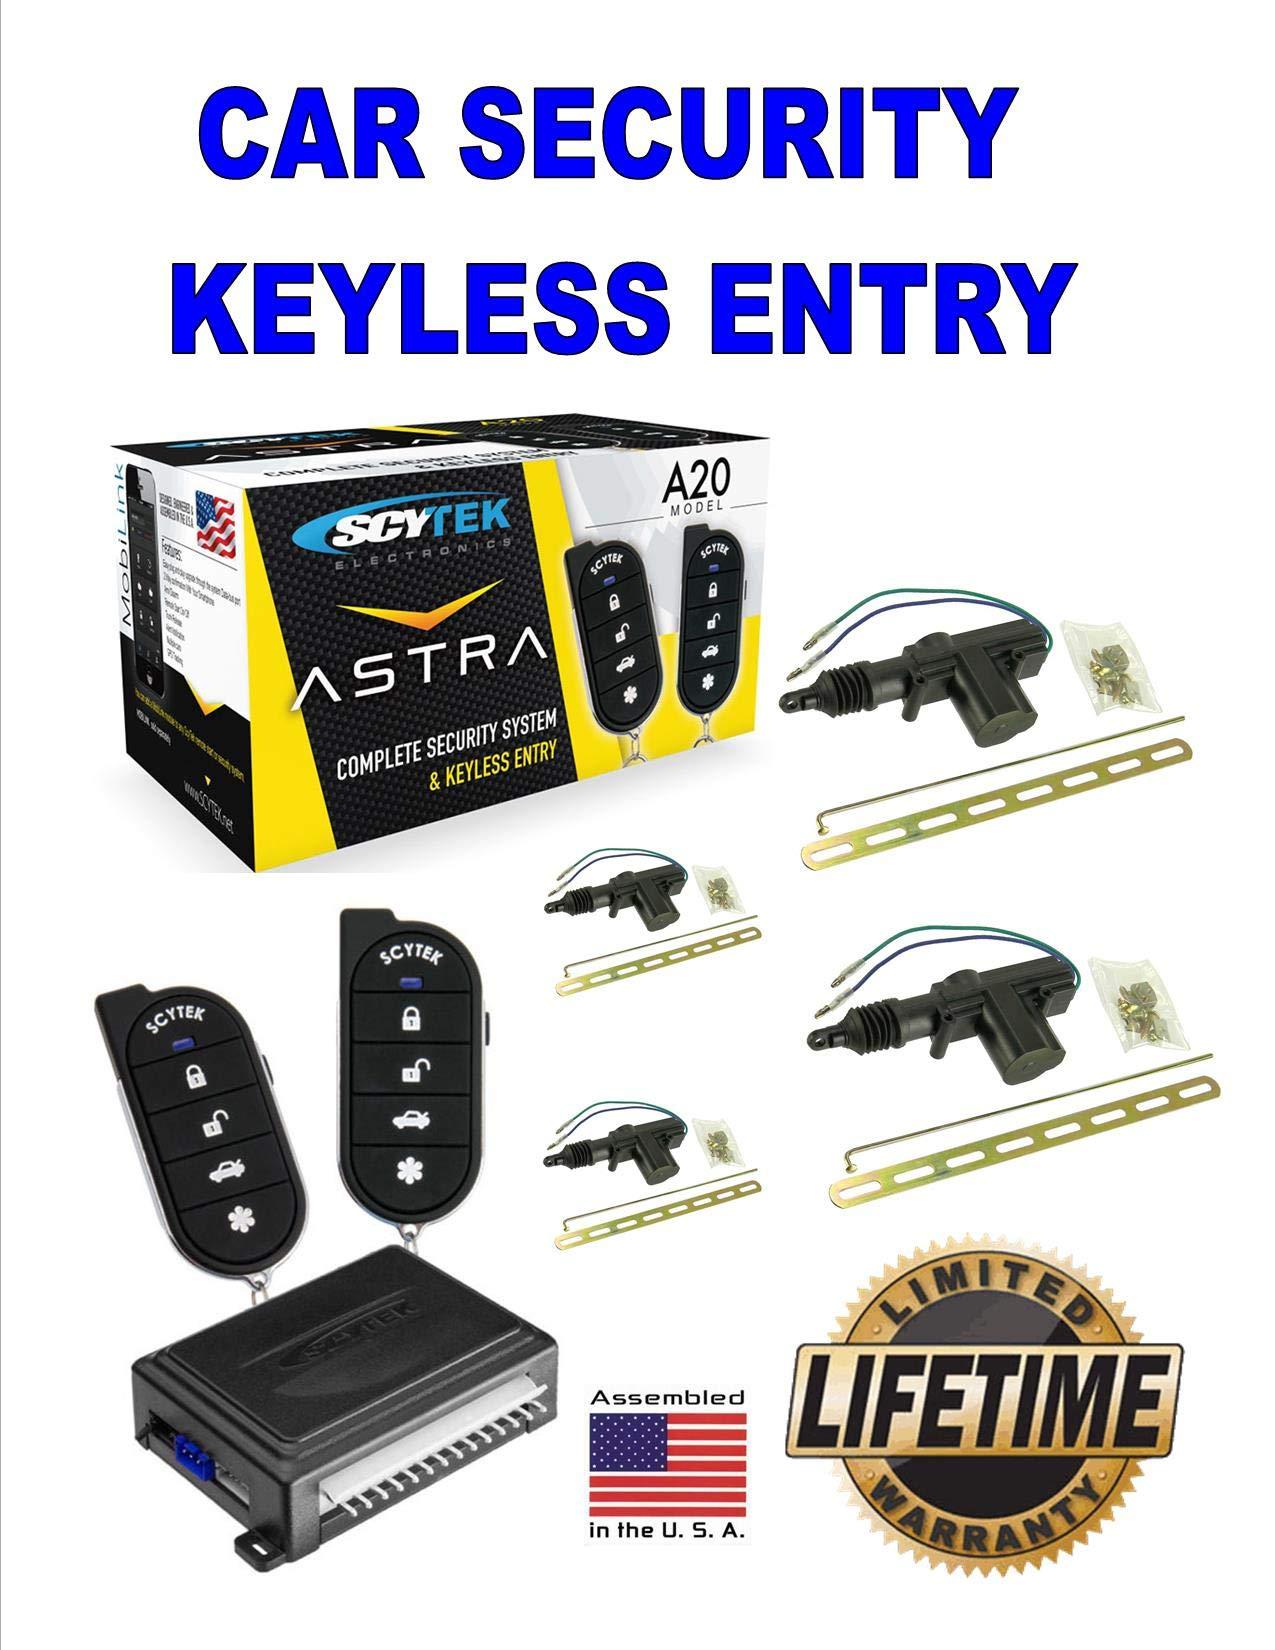 Car Alarm Security System 4 Door Locks Keyless Entry 2 Remote Control Scytek A20